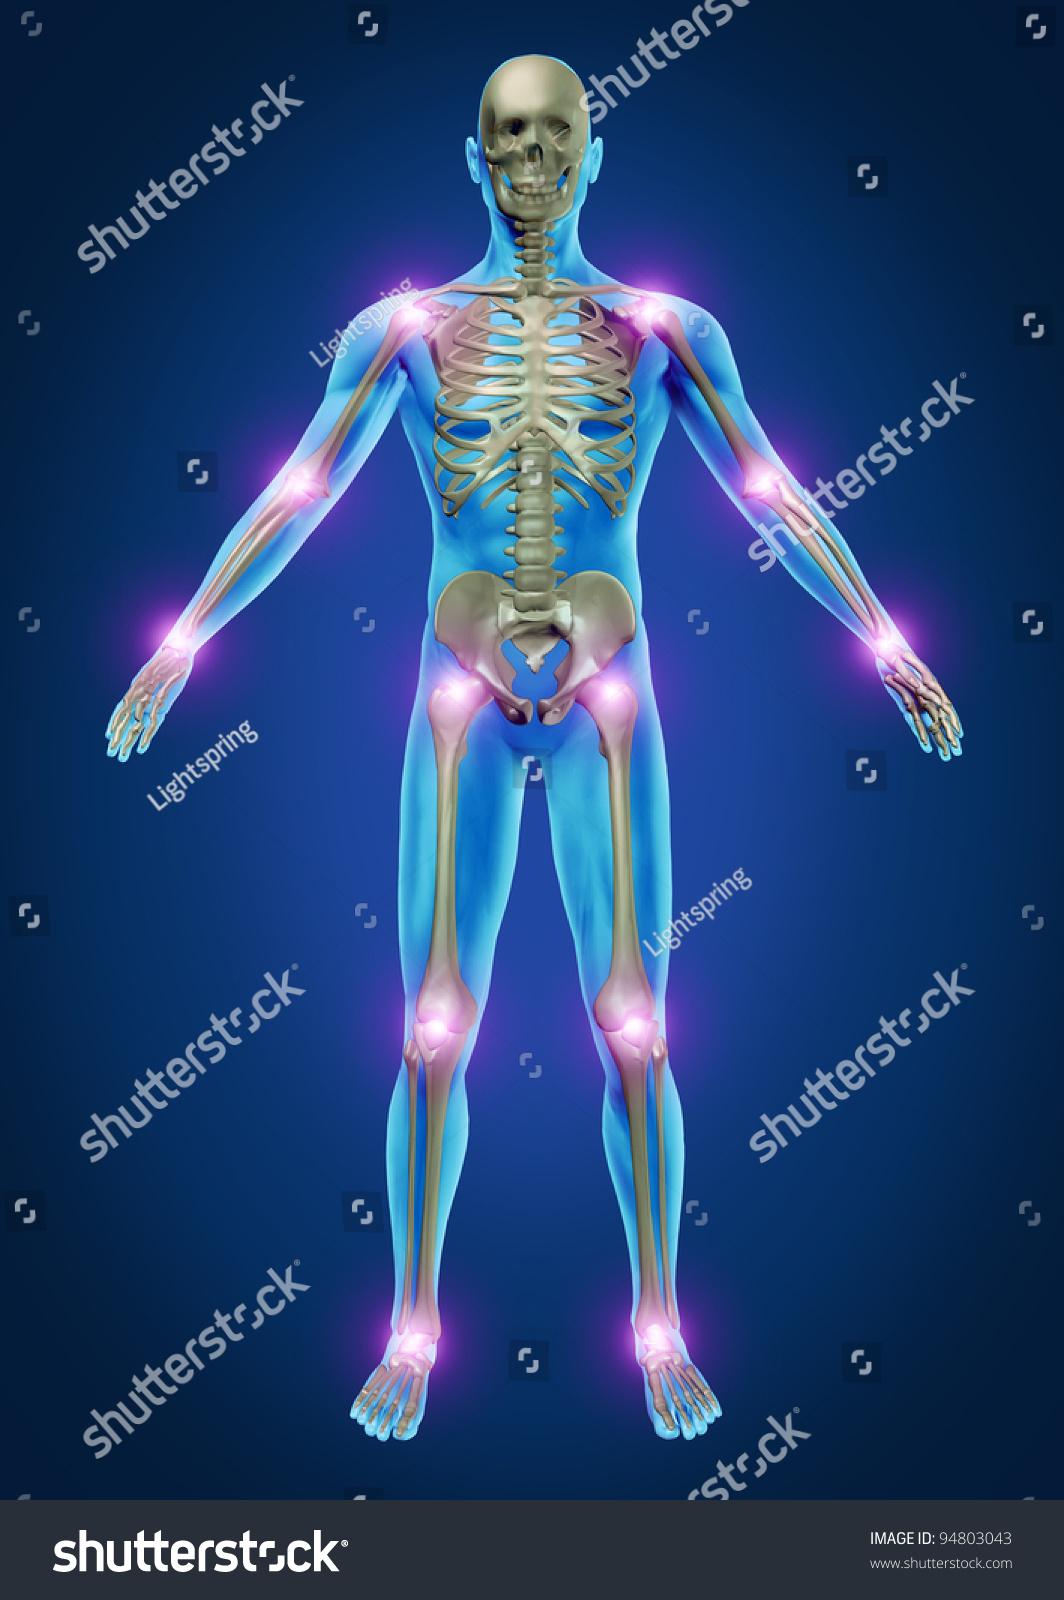 Human Painful Joints Skeleton Anatomy Body Stock